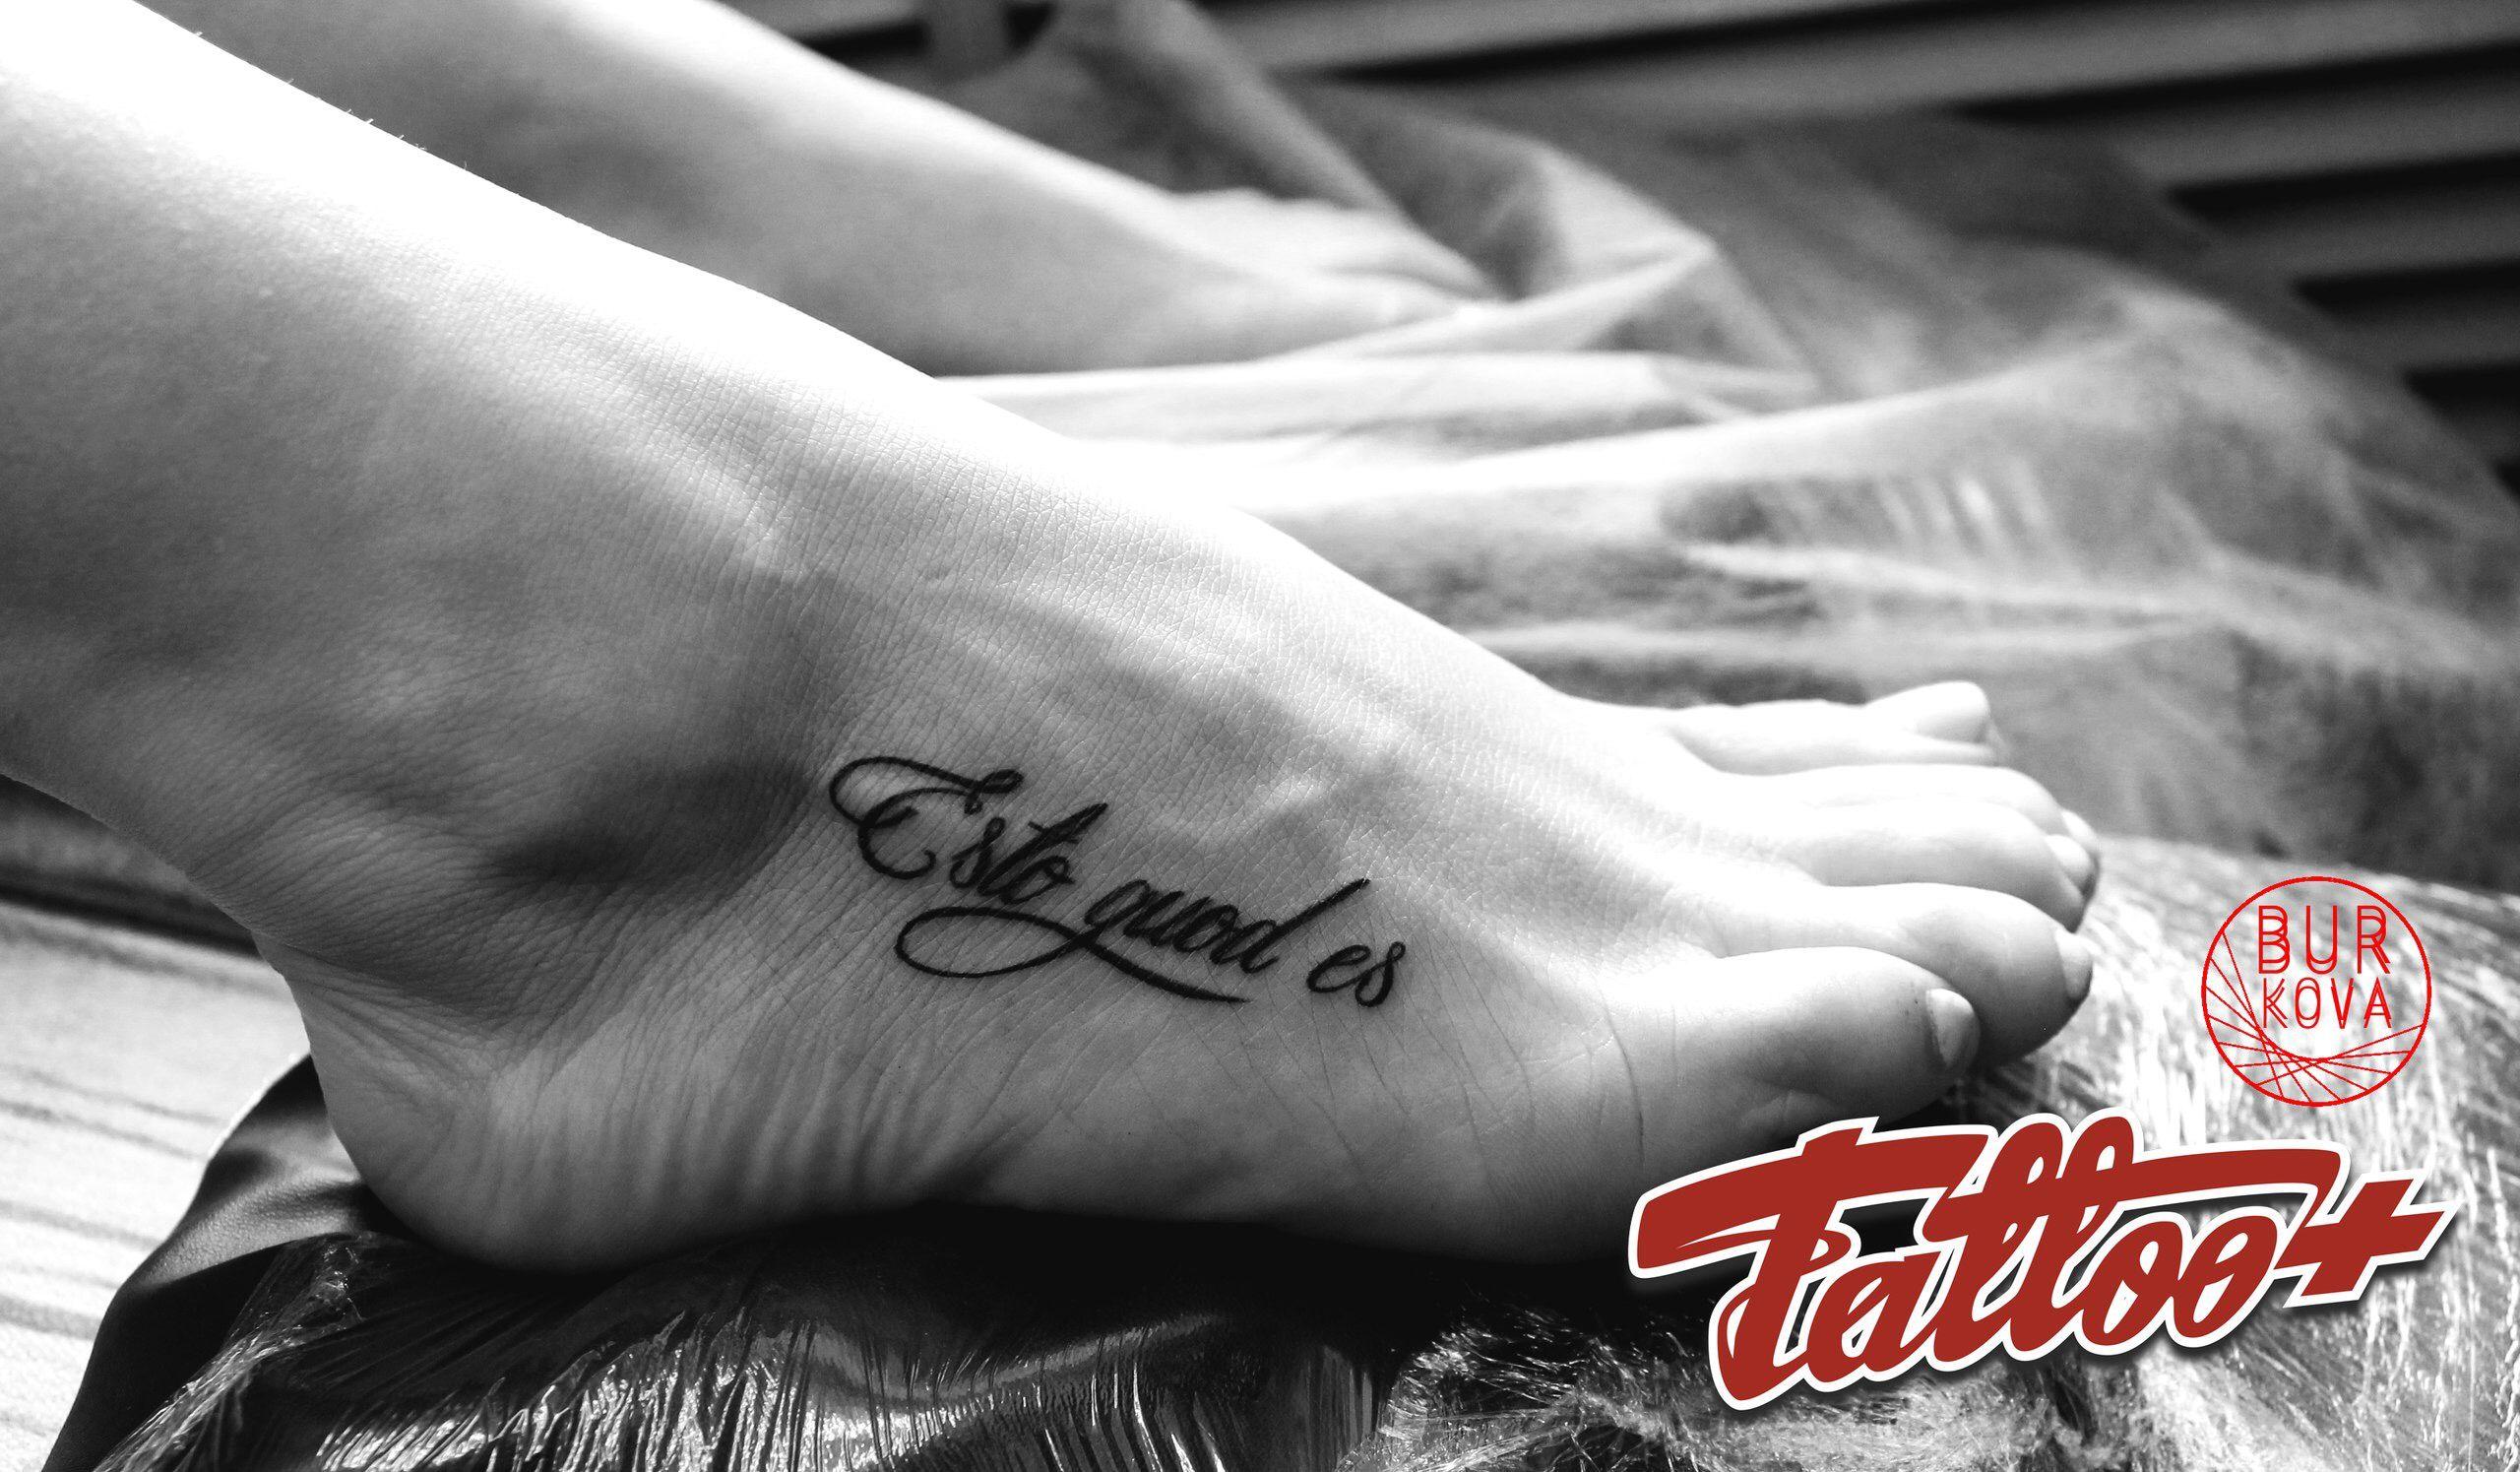 тату татуировка надпись Tattoo Font татуировка тату и татуировки